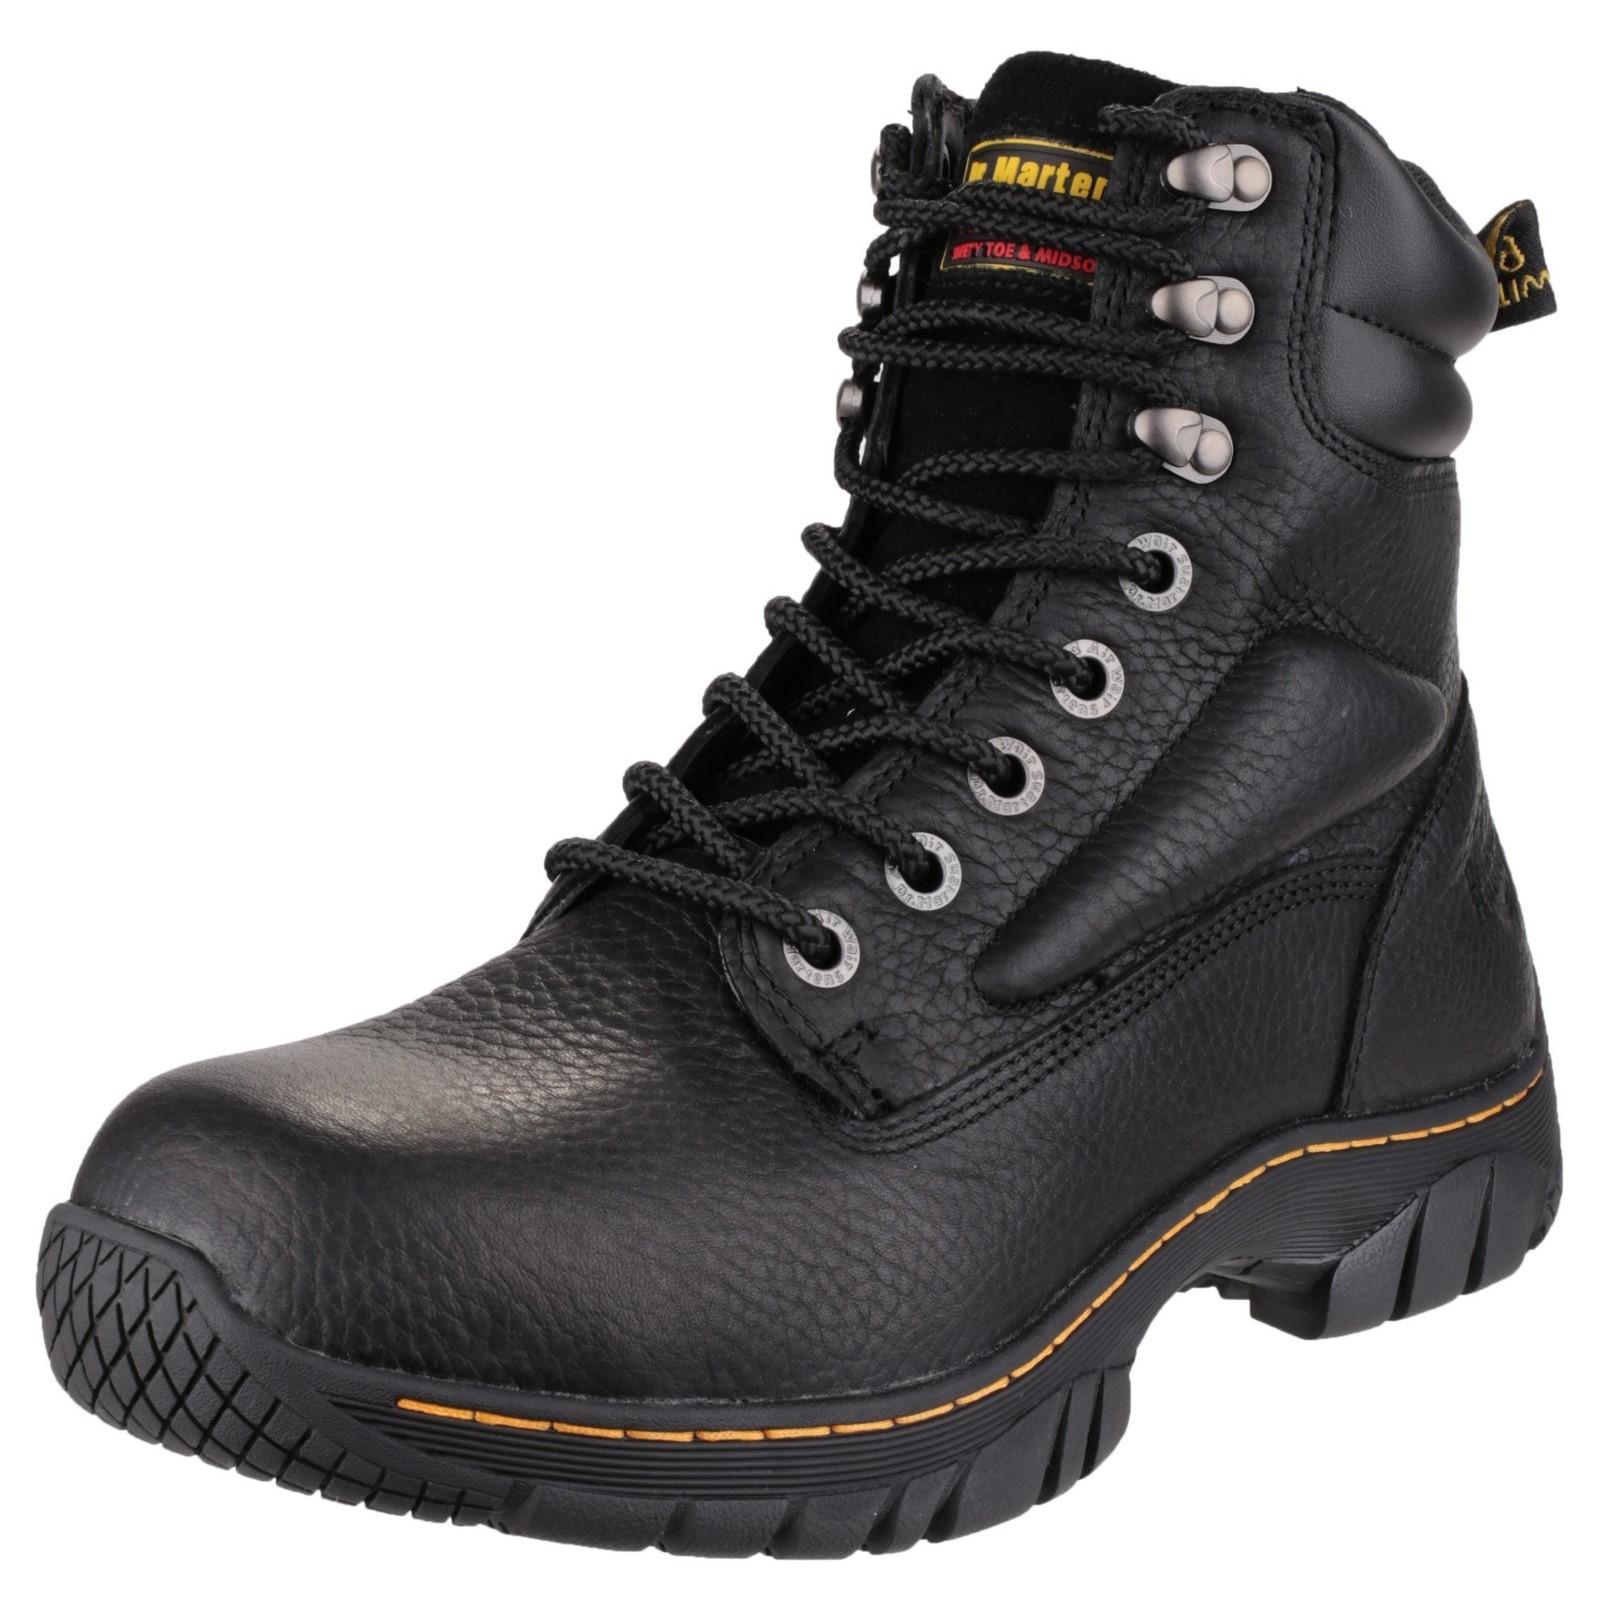 Dr Martens Martens Martens Unisex Purlin Sicherheits Stiefel Schwarz Größe 6 Eu 39  d5216d